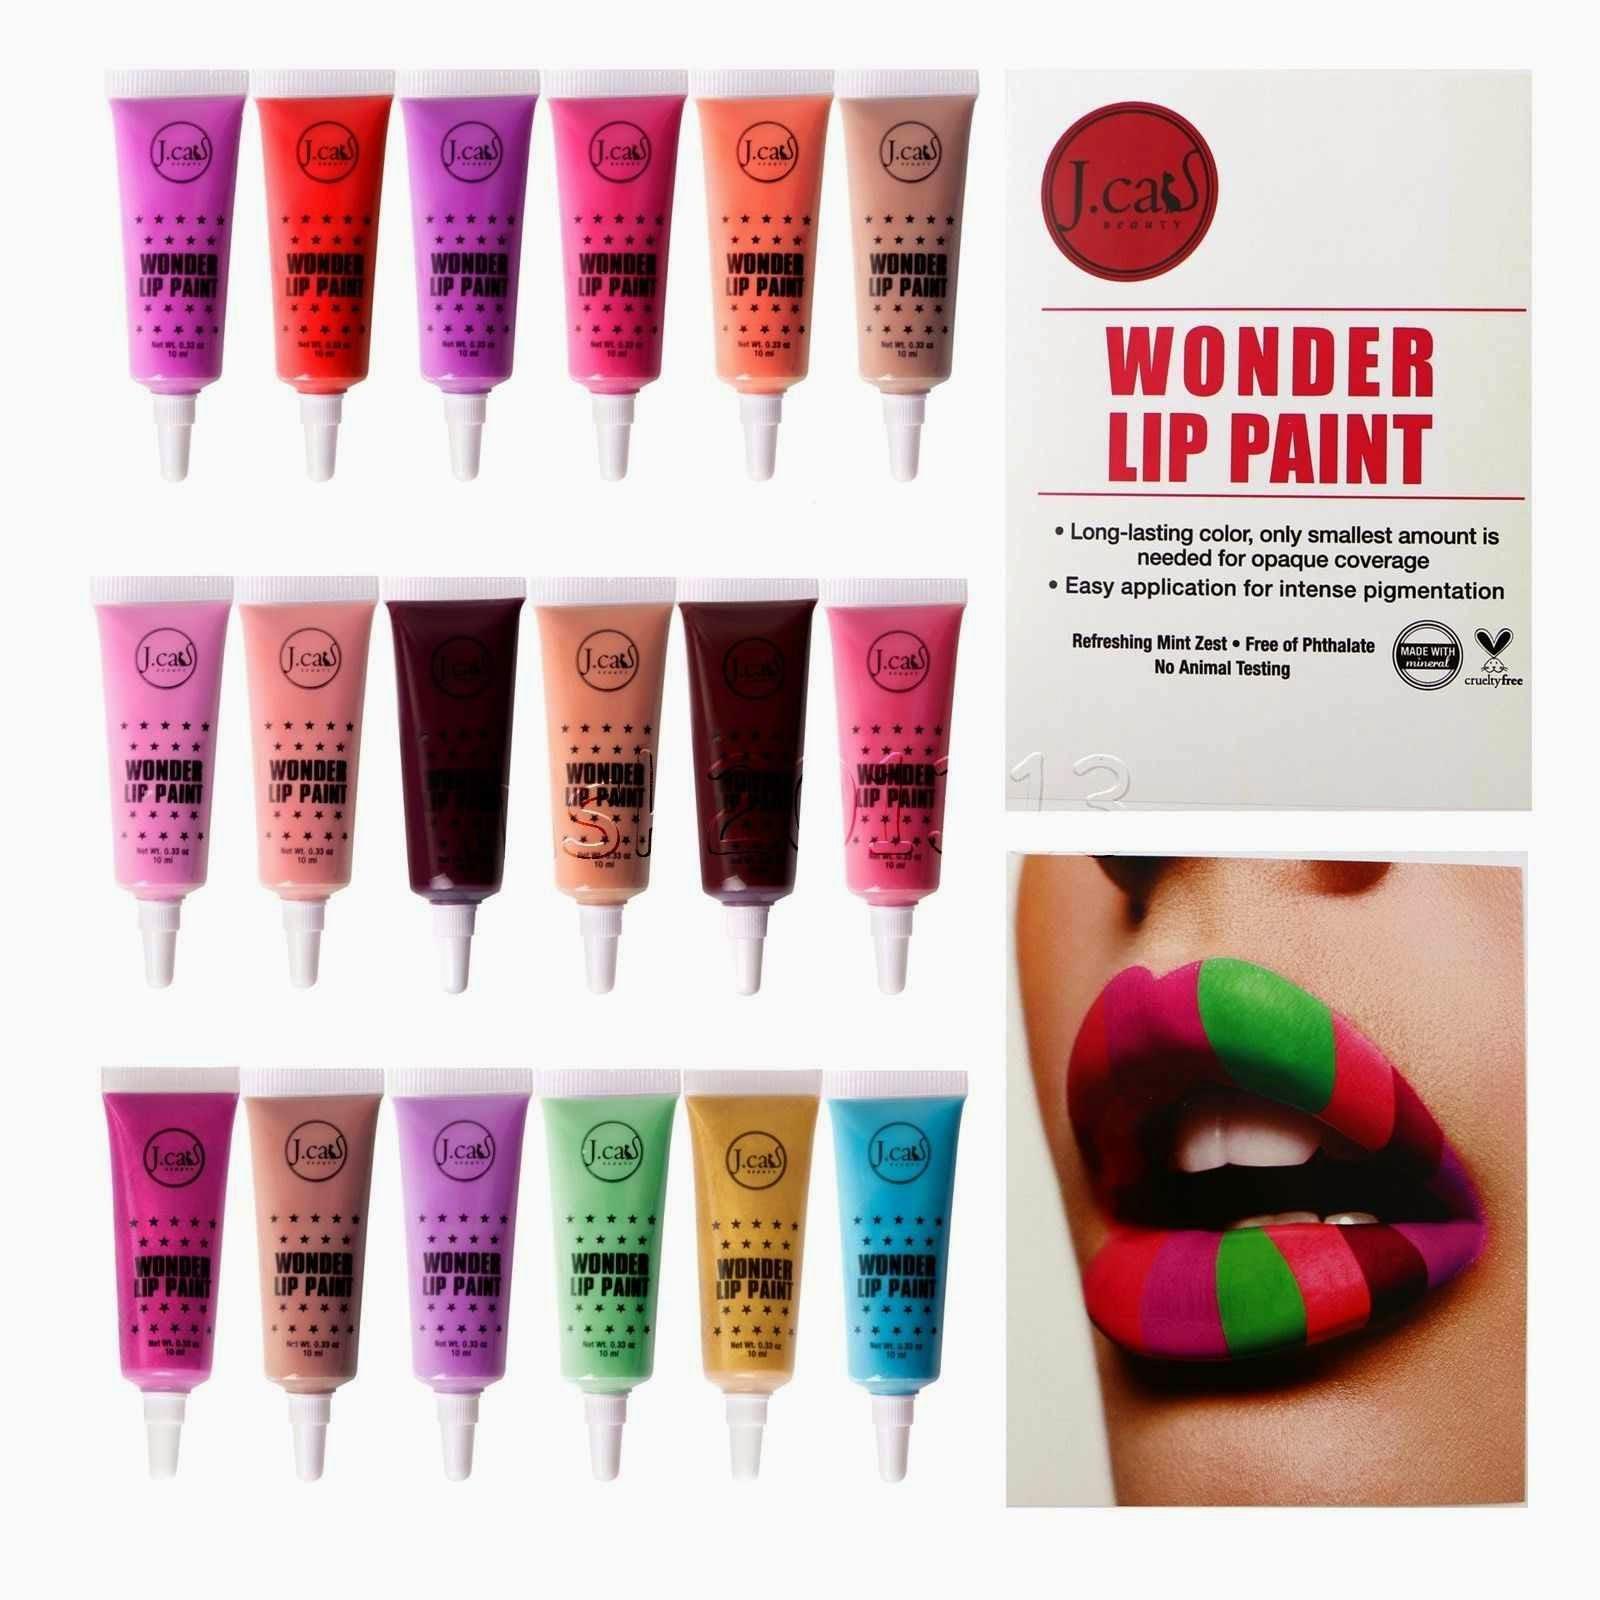 Wonder Lip Paint by J.Cat Beauty #7